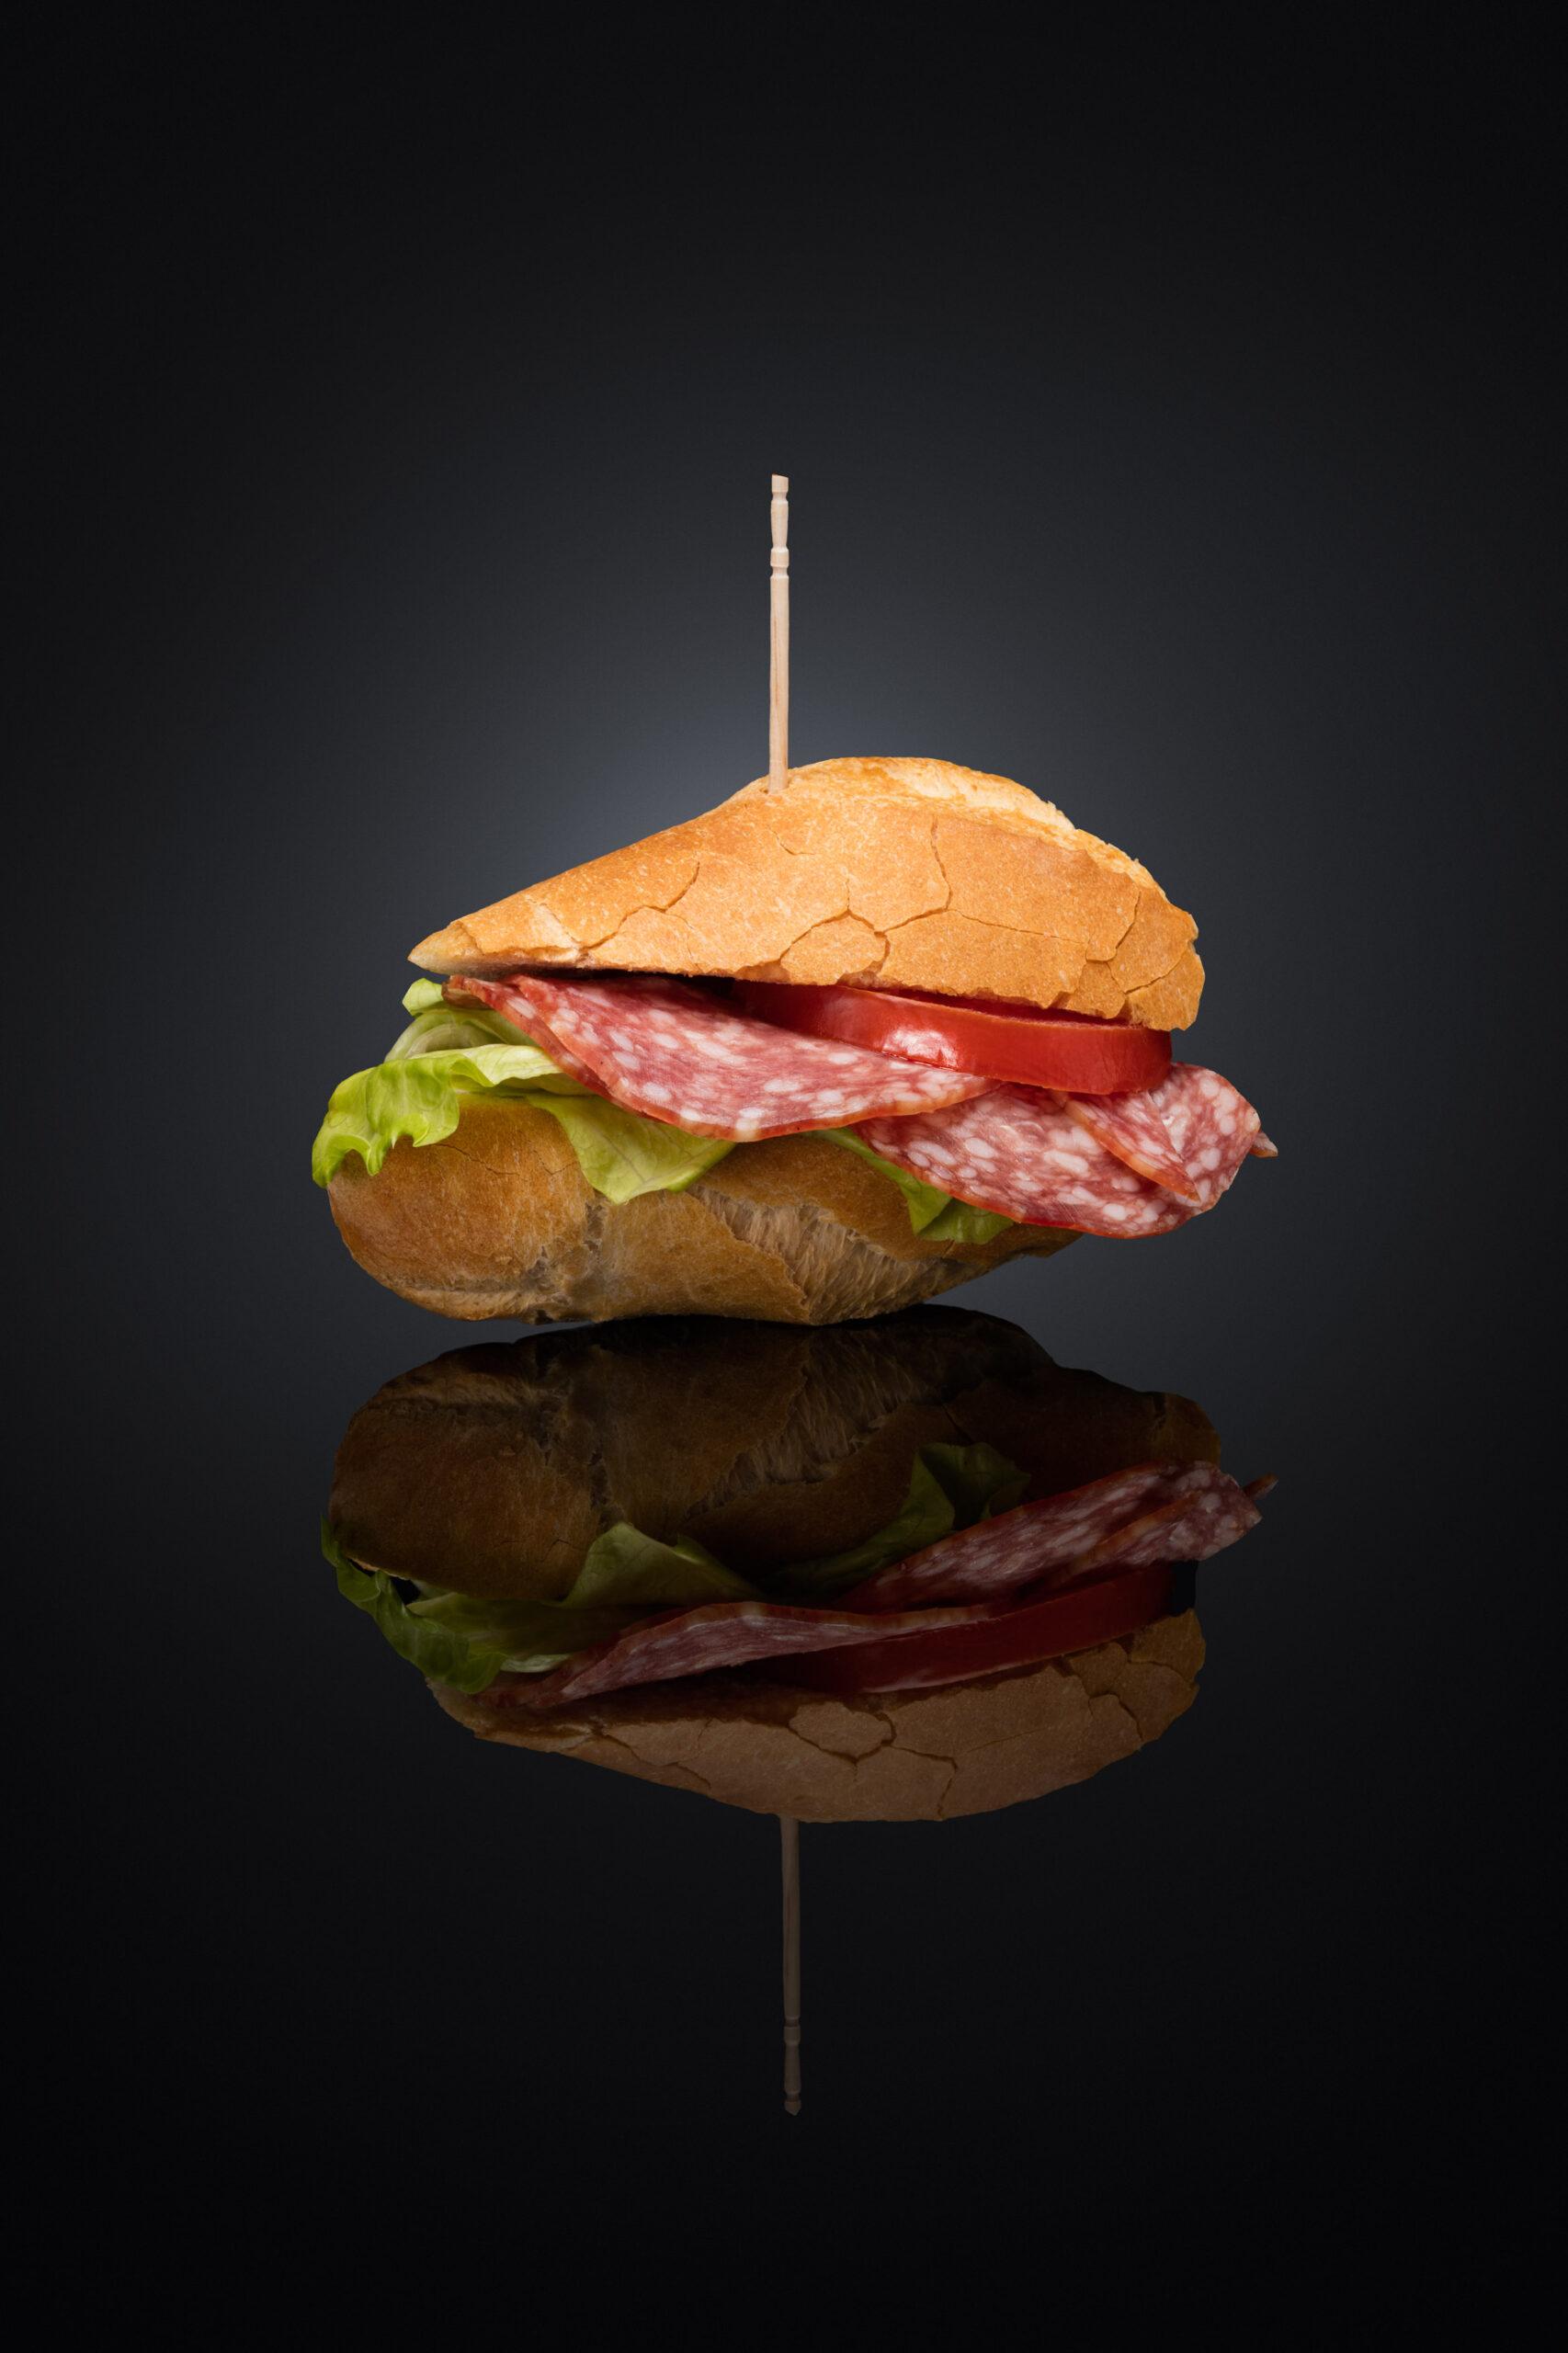 Meier & Kamer Produktefotografie: Feines Sandwich vom Schillig Bäckerei, Bürglen